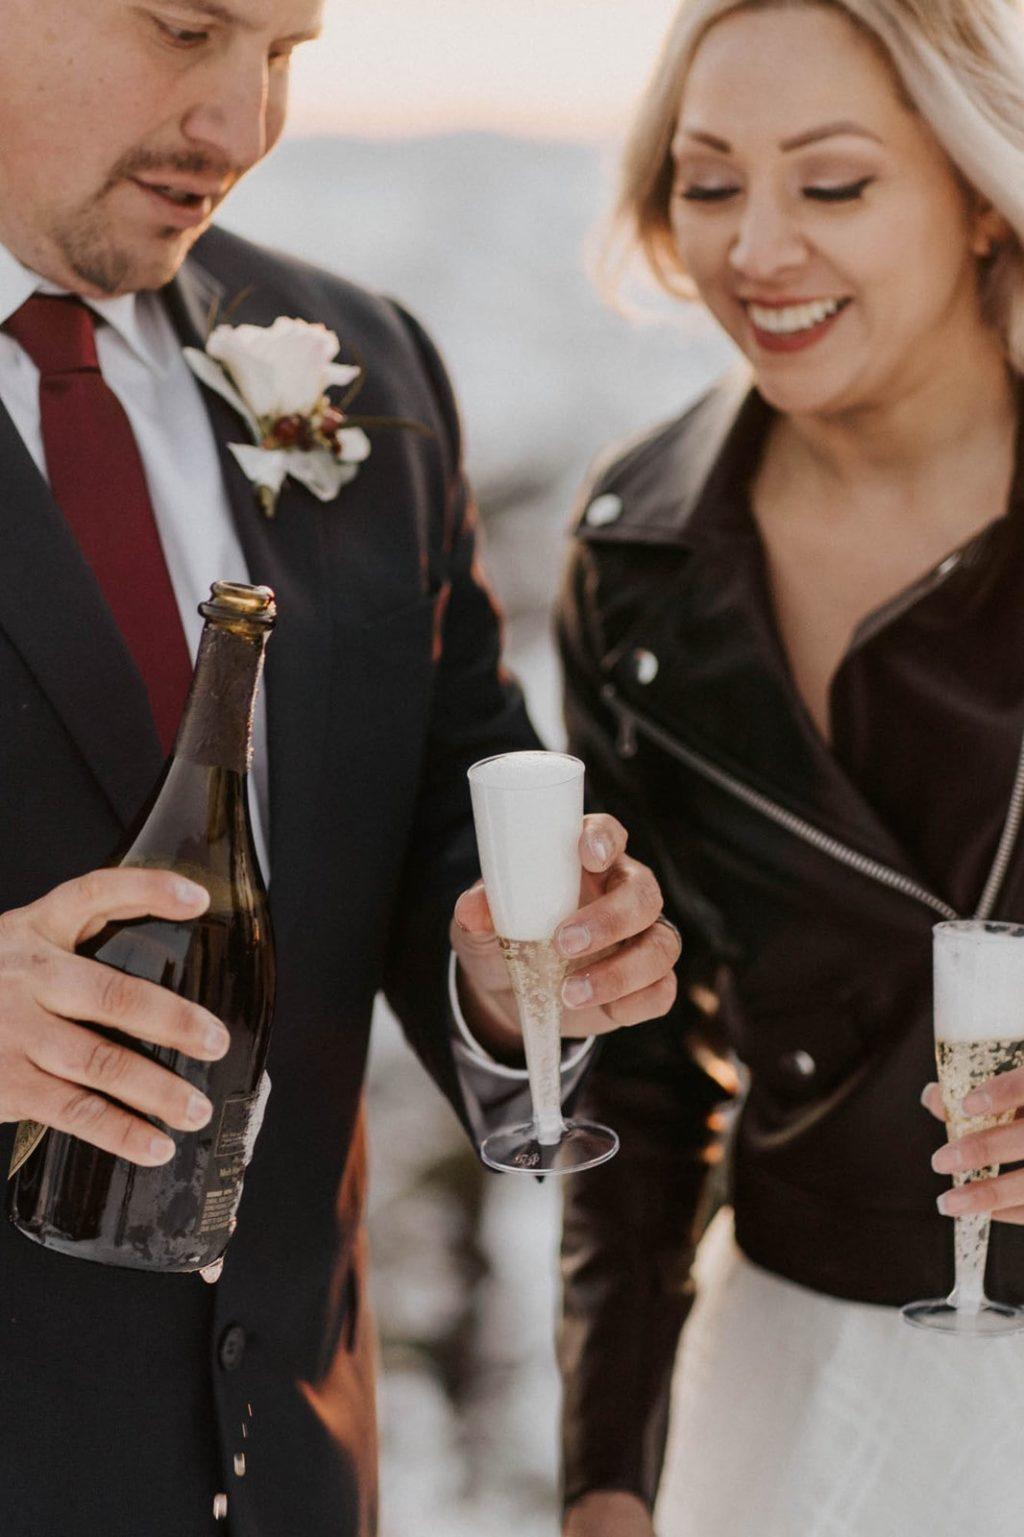 closeup of champagne glasses